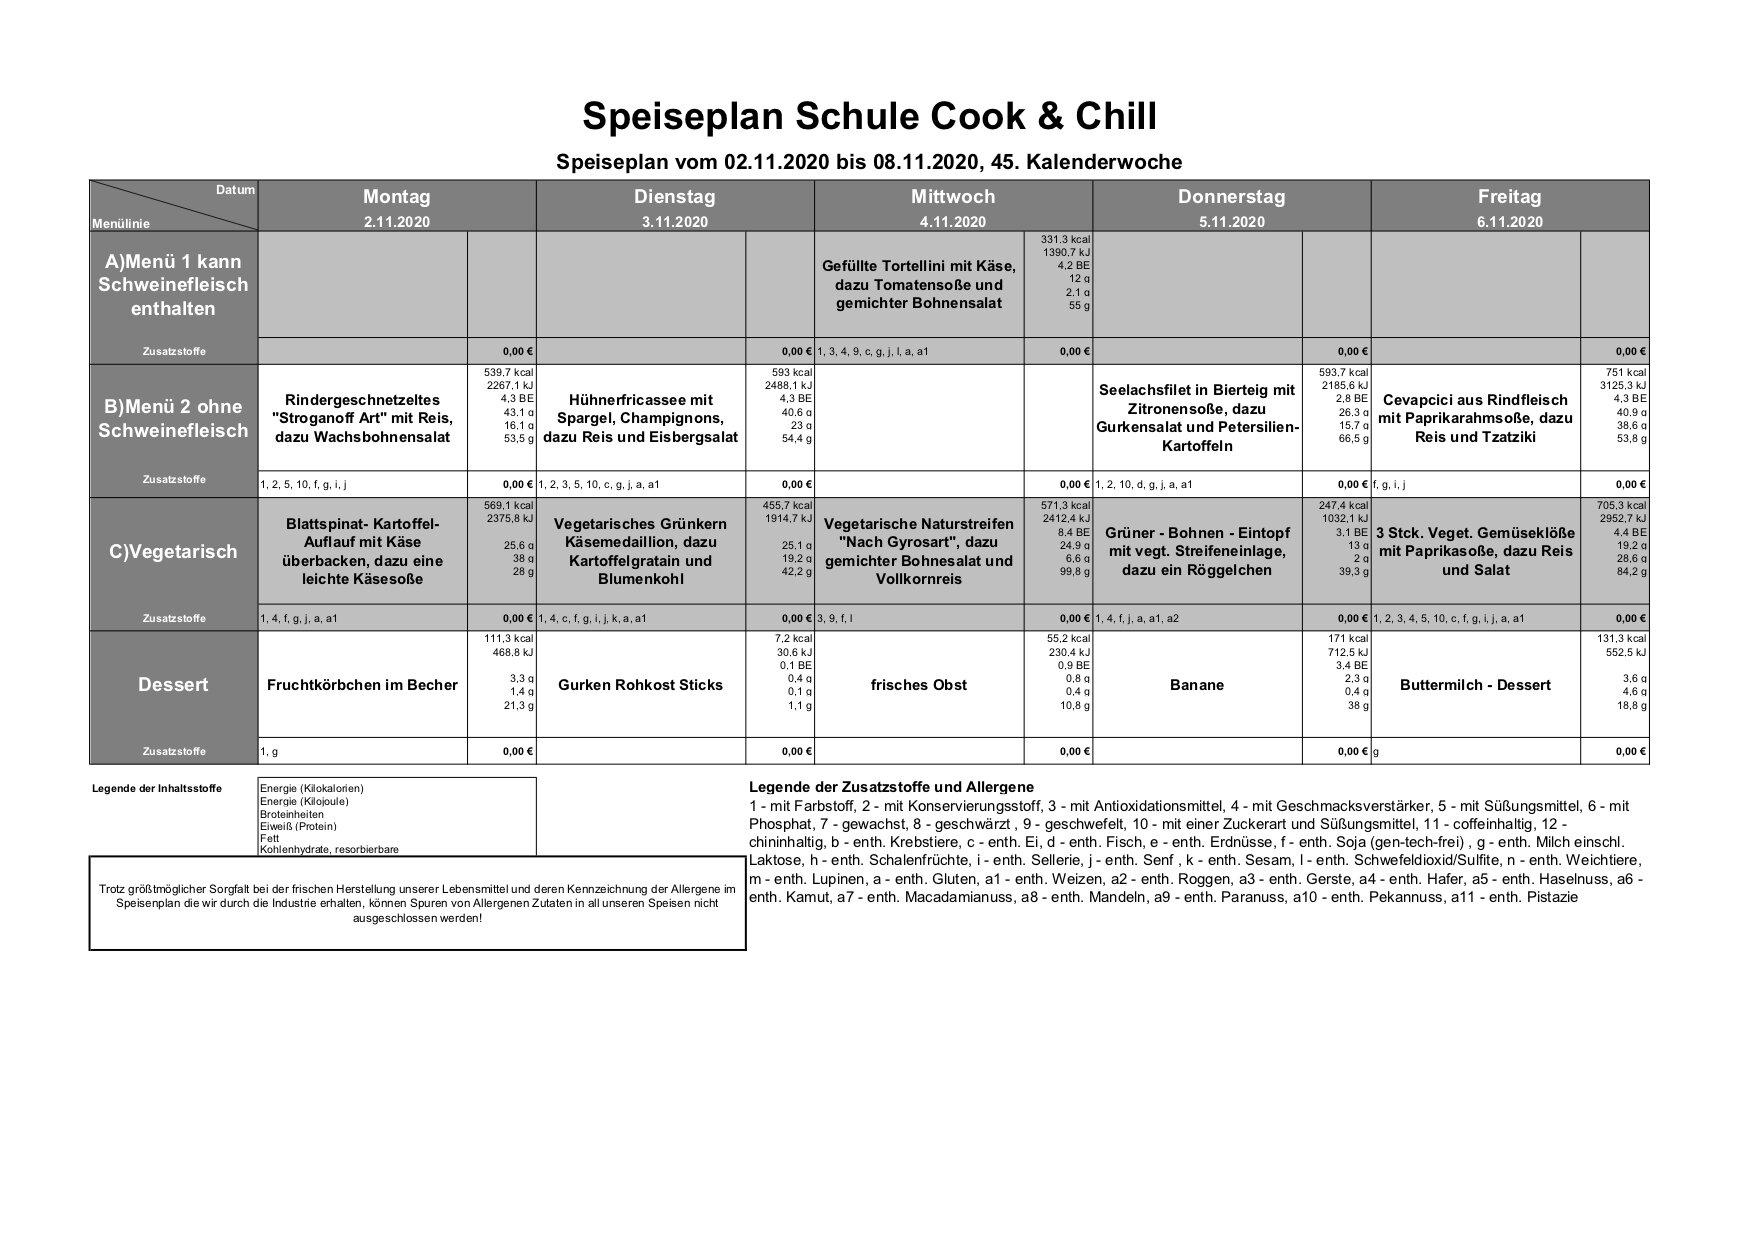 Speiseplan 2.11. - 6.11.2020 (KW 45)